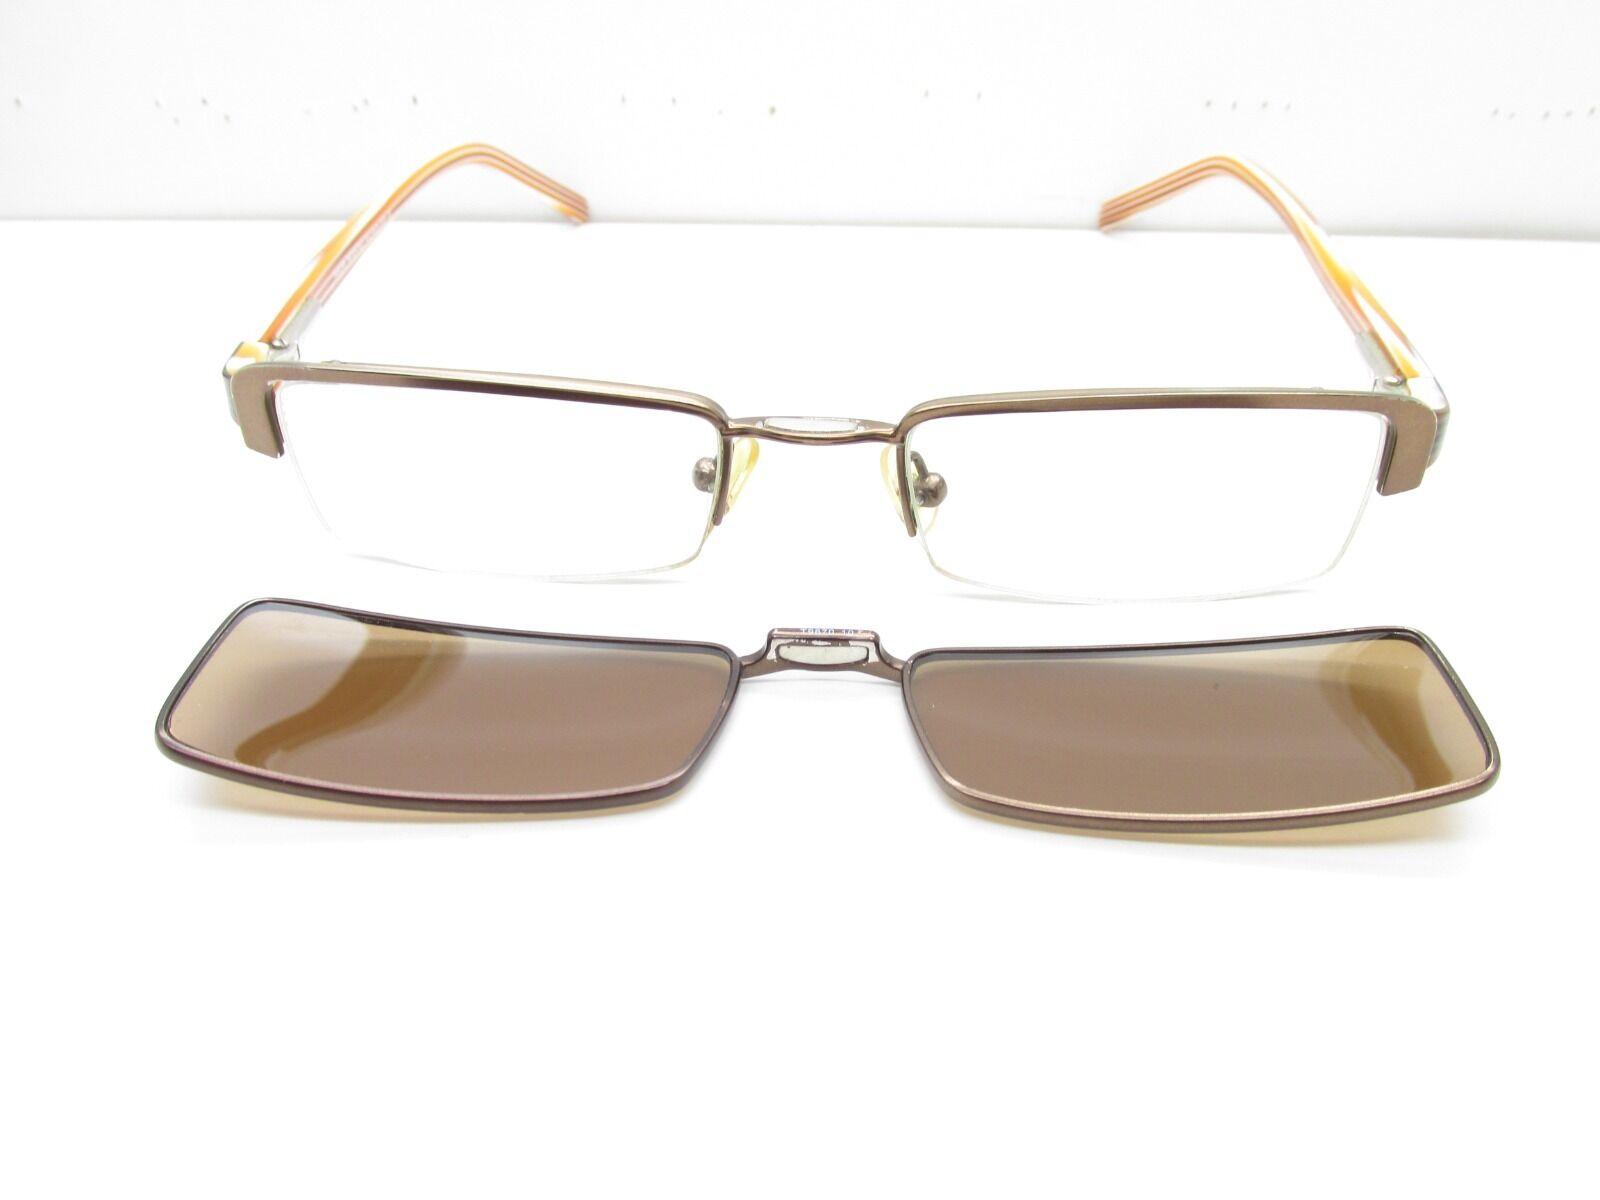 Takumi T9670 Eyewear Frames W Sunglass Clip-on 49-19-135 Rectangle ...